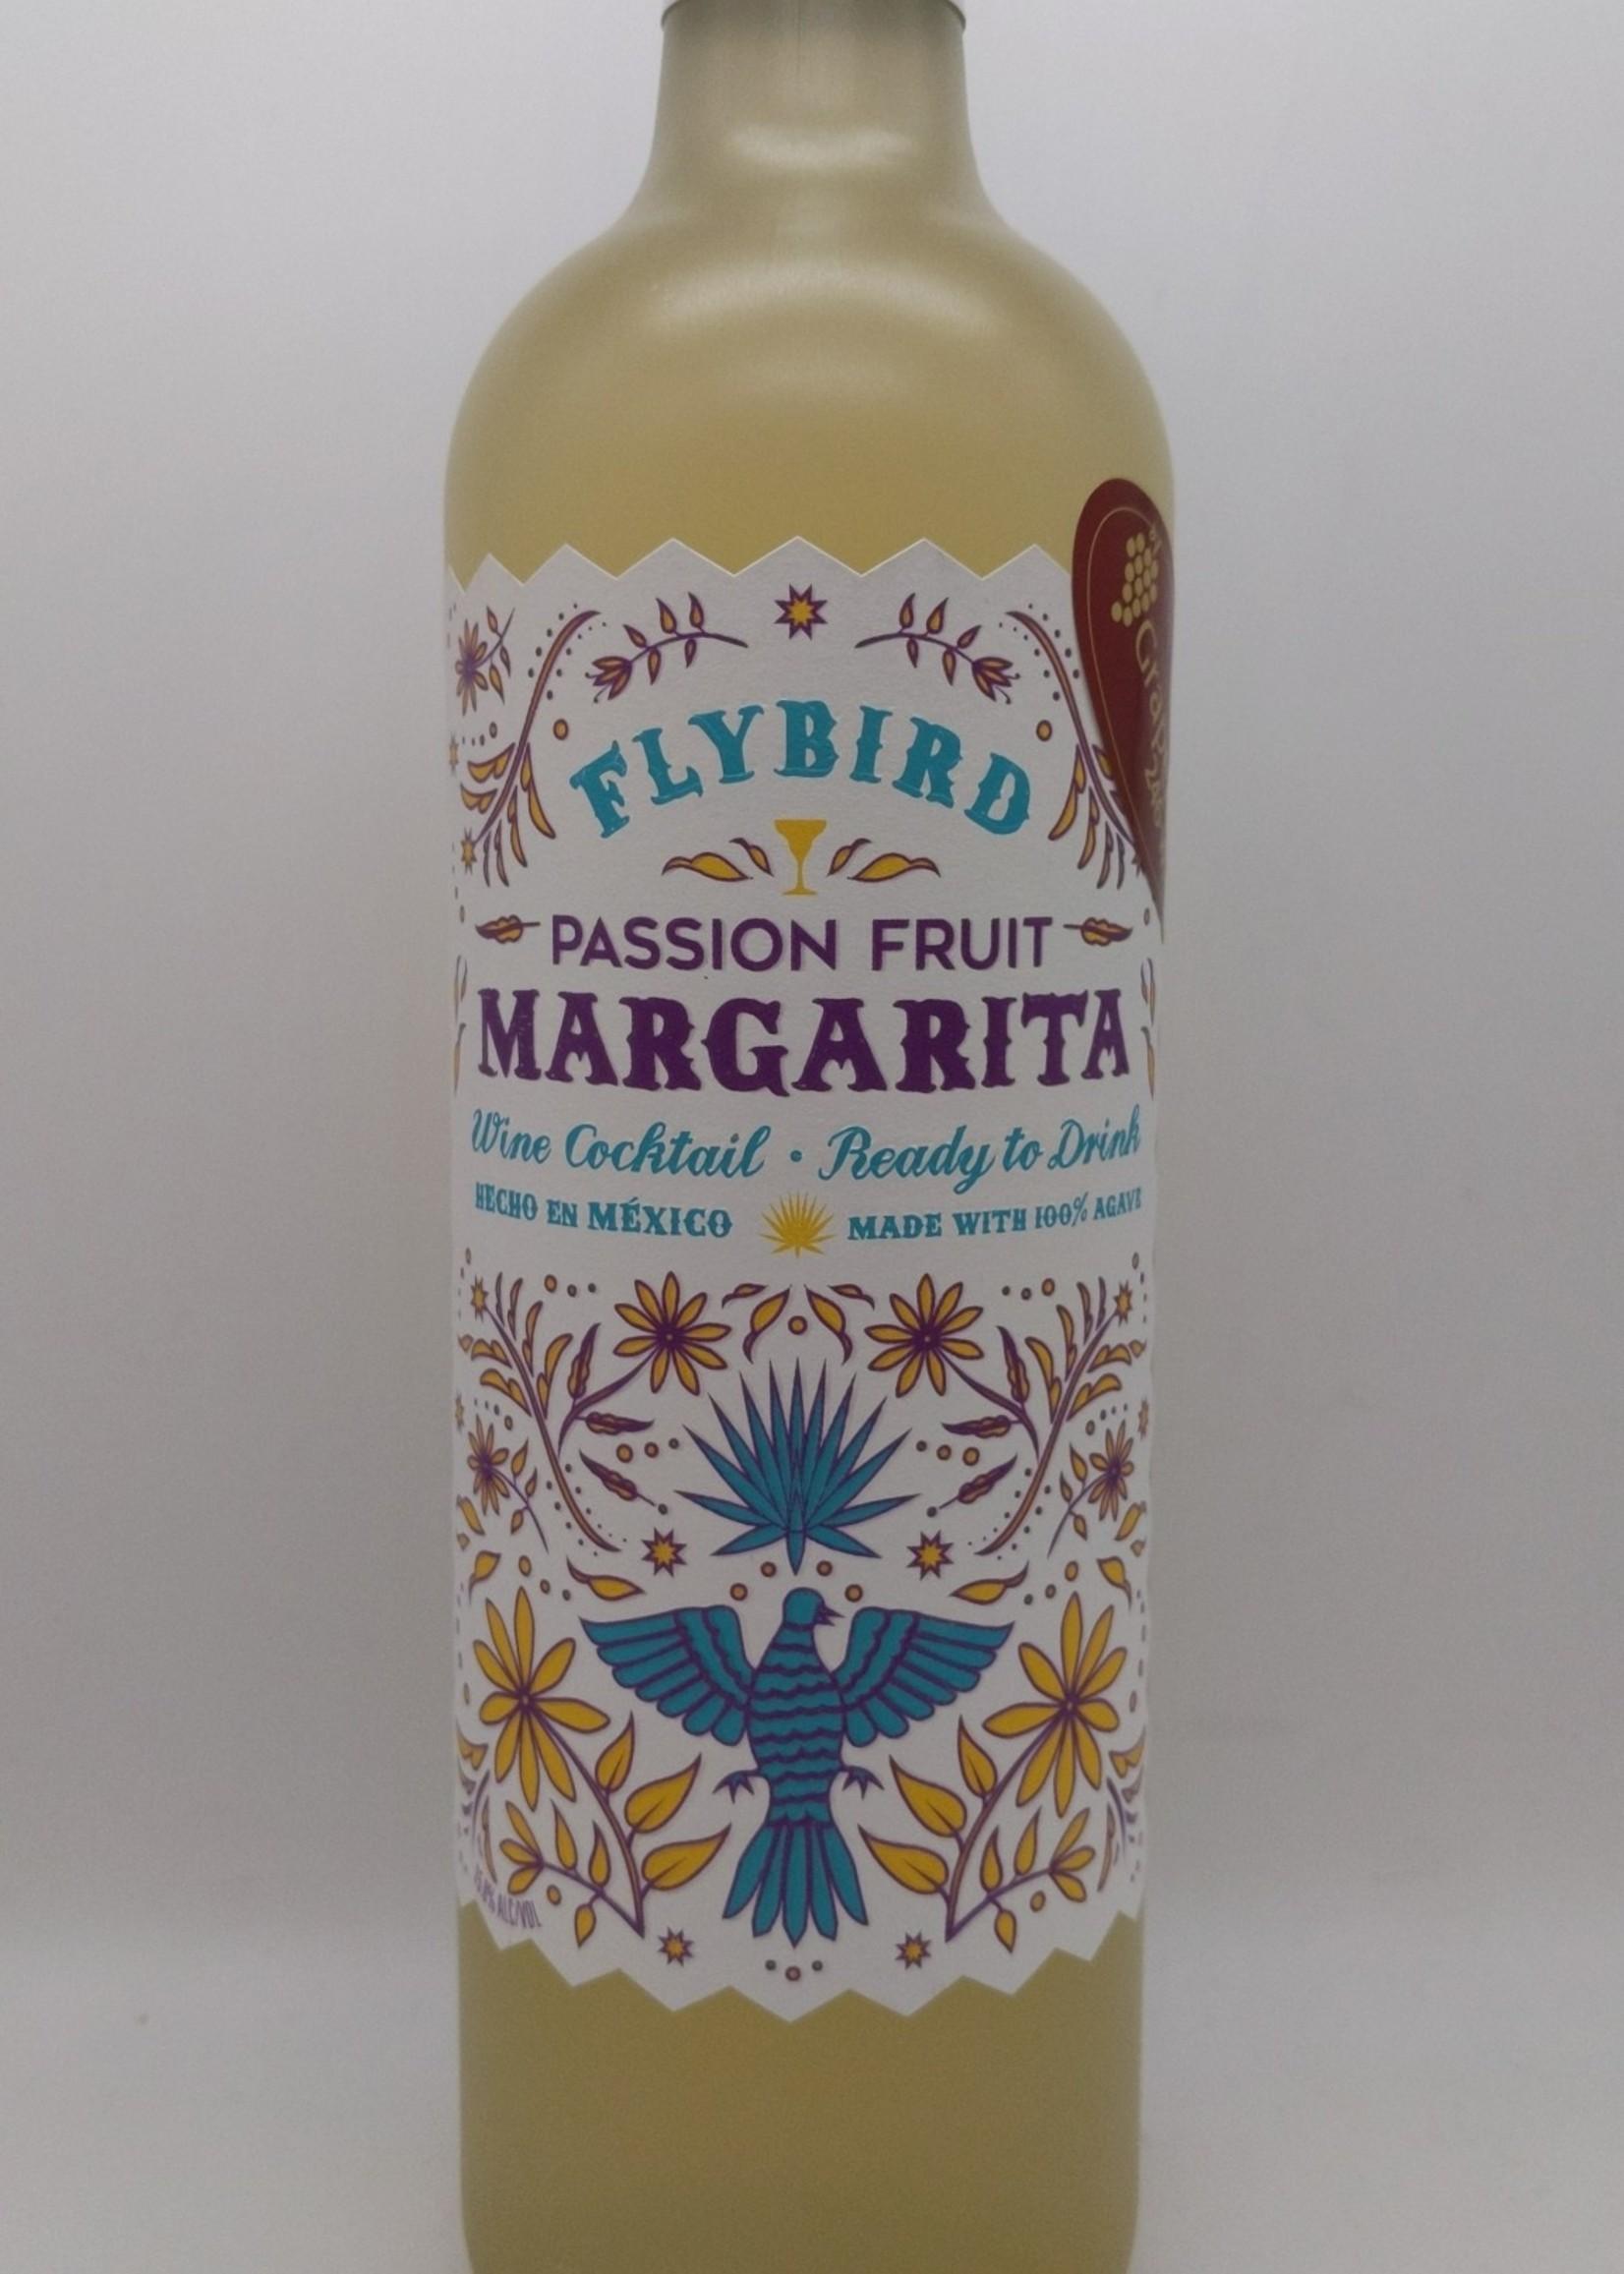 FLYBIRD PASSION FRUIT MARGARITA 750 ml